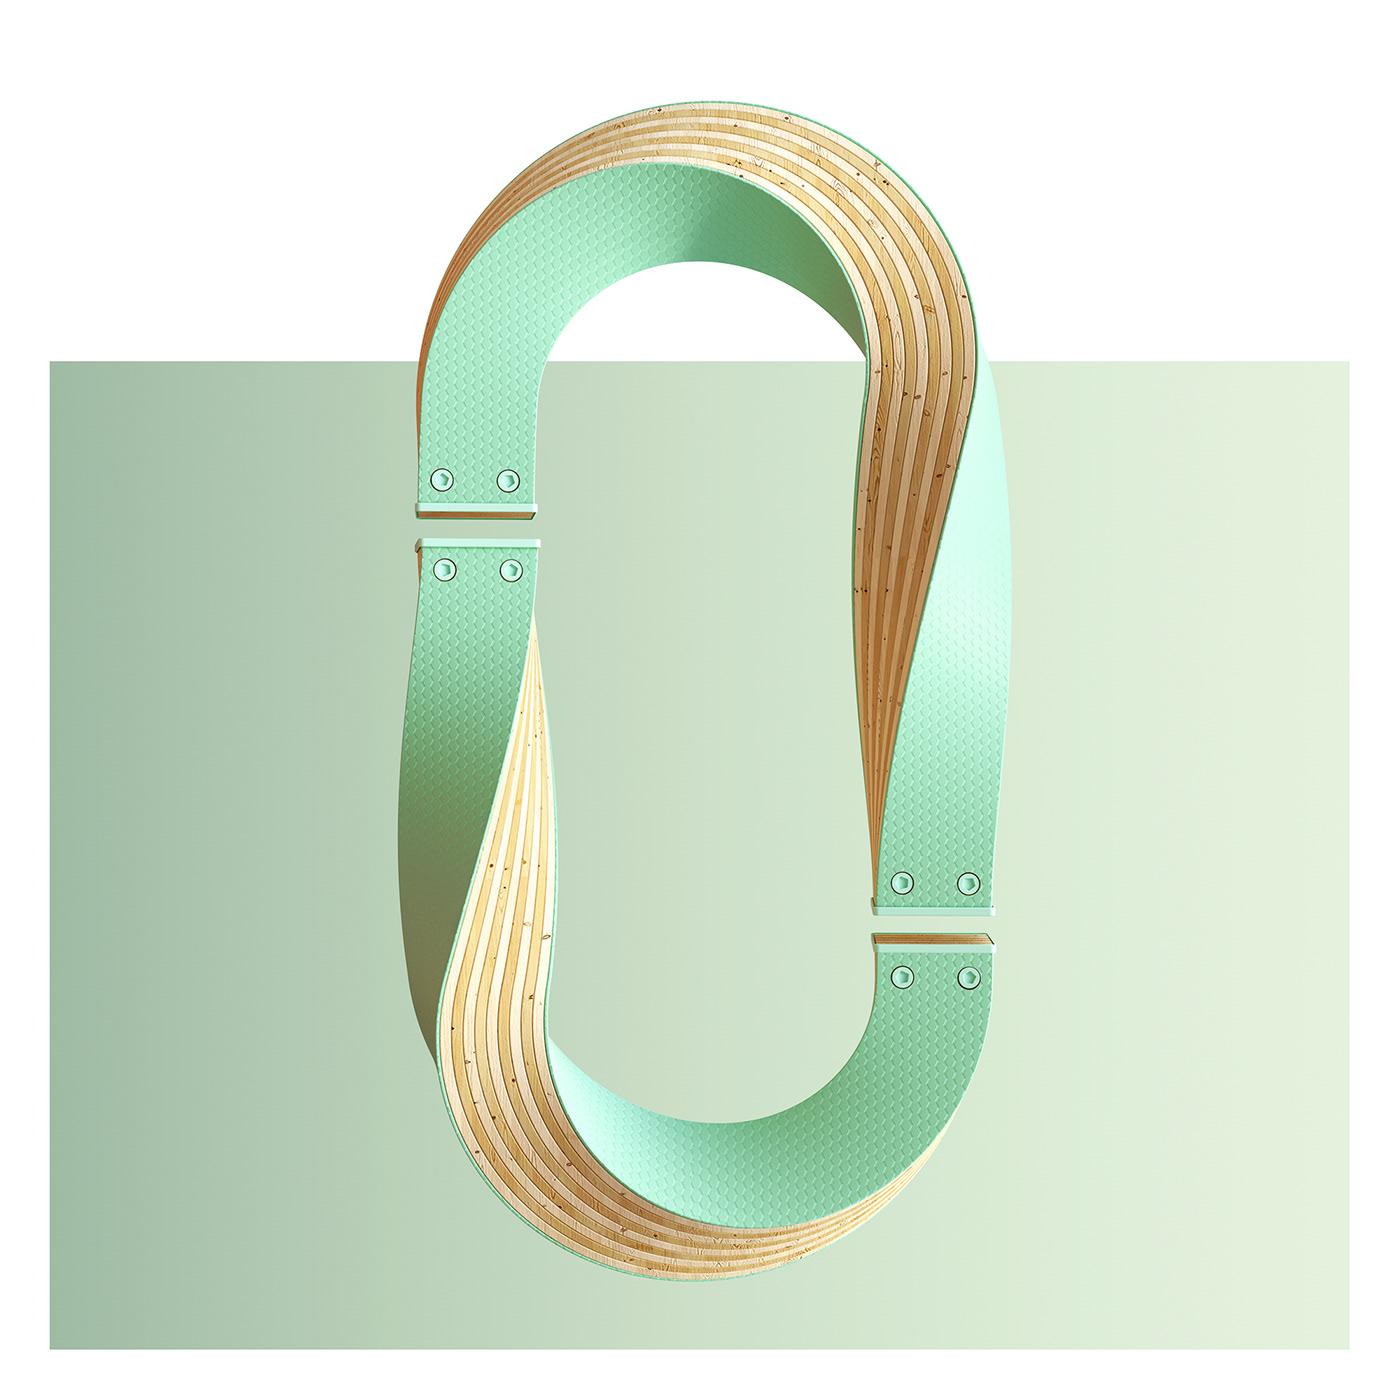 36daysoftype type 3D design 36days 3DType ArtDirection CGI 3dart typography